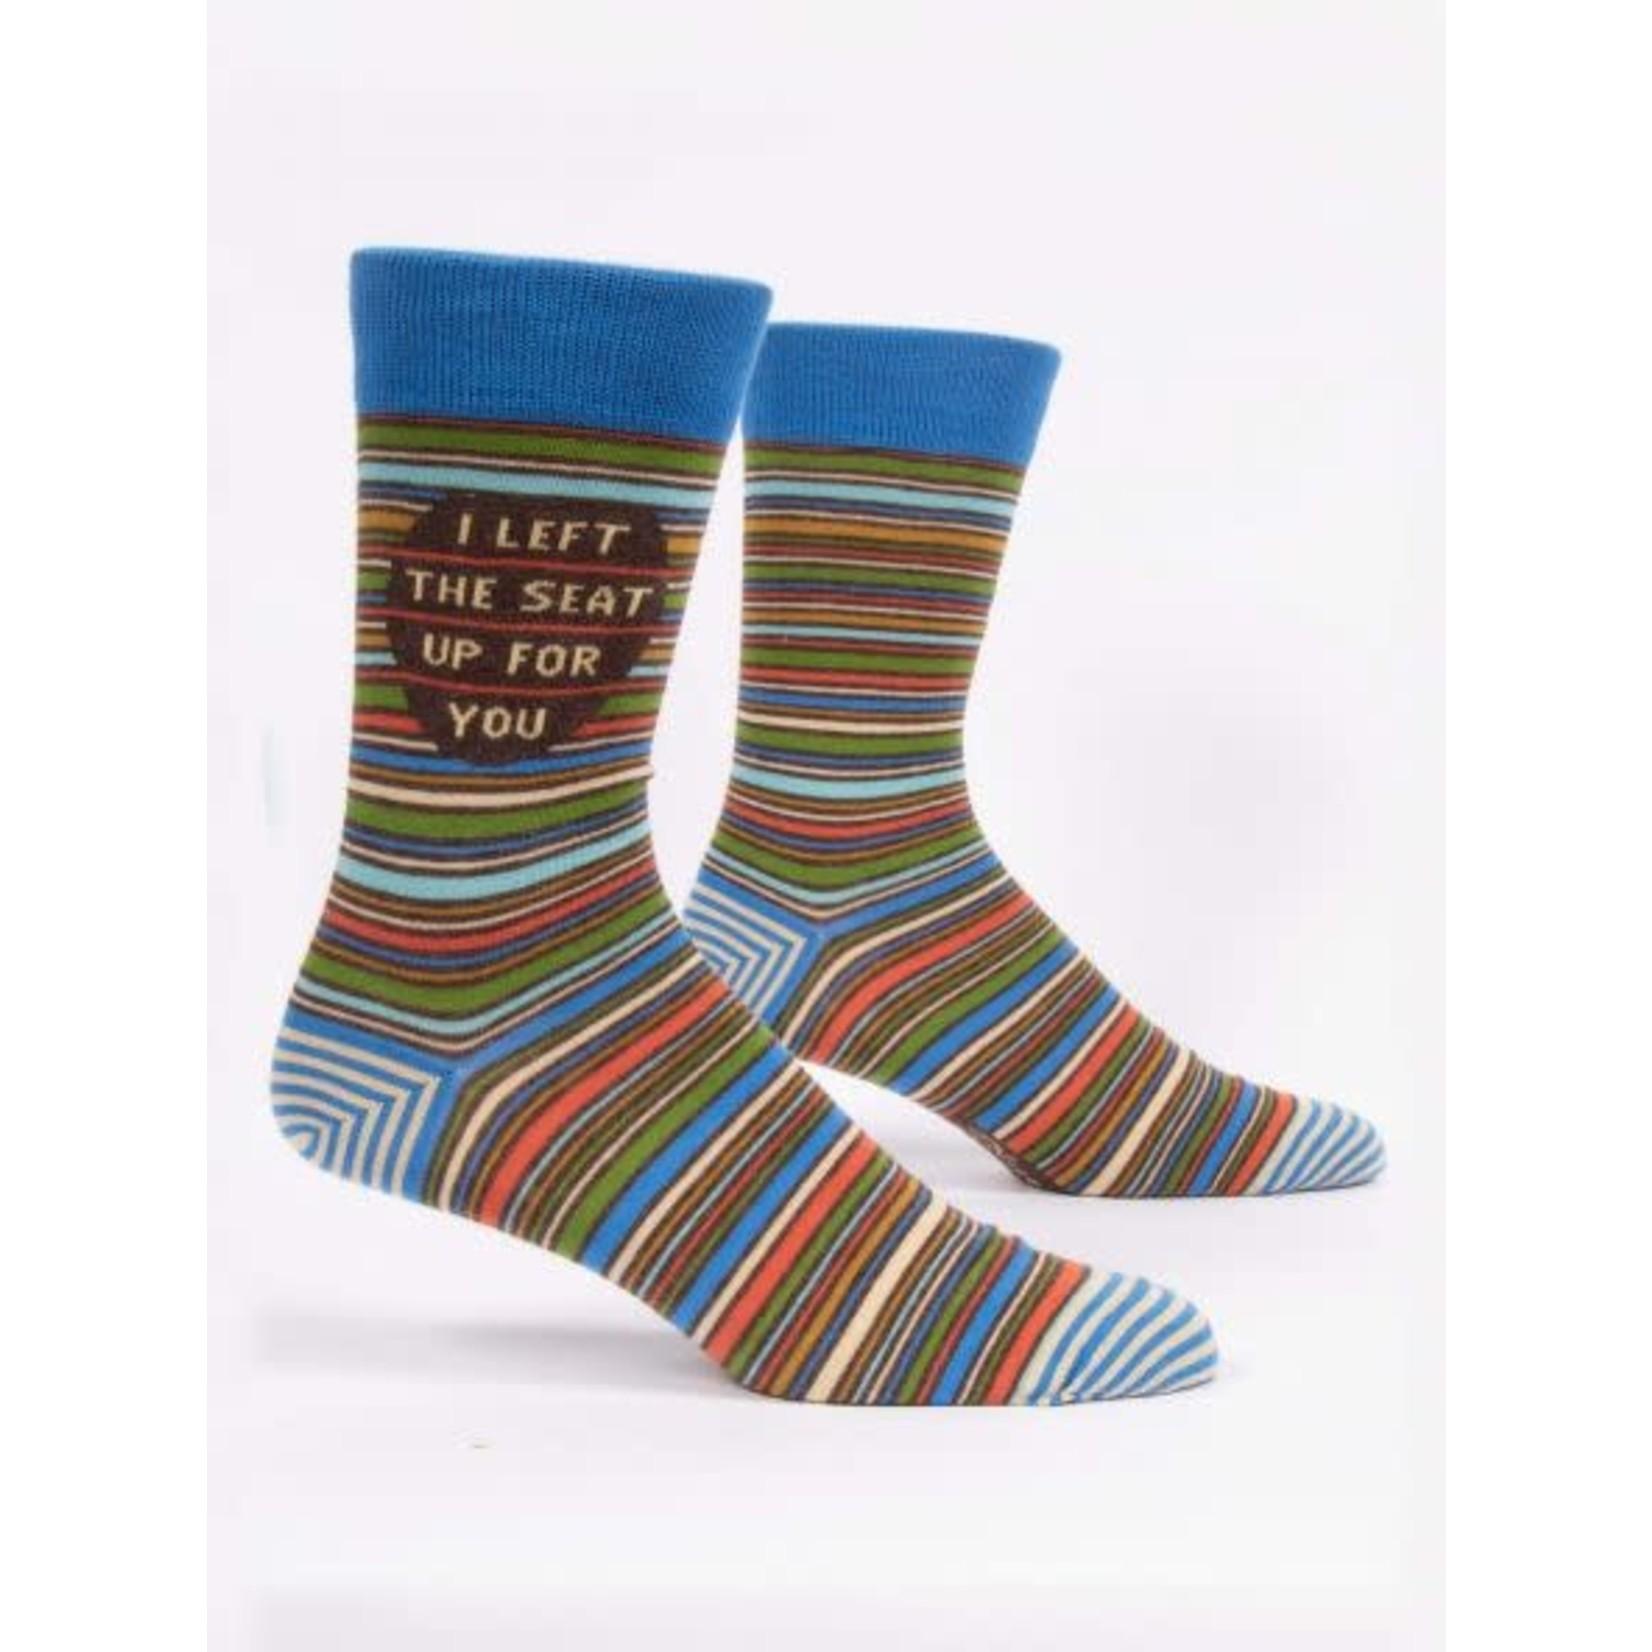 BlueQ Men's Funny Crew Socks